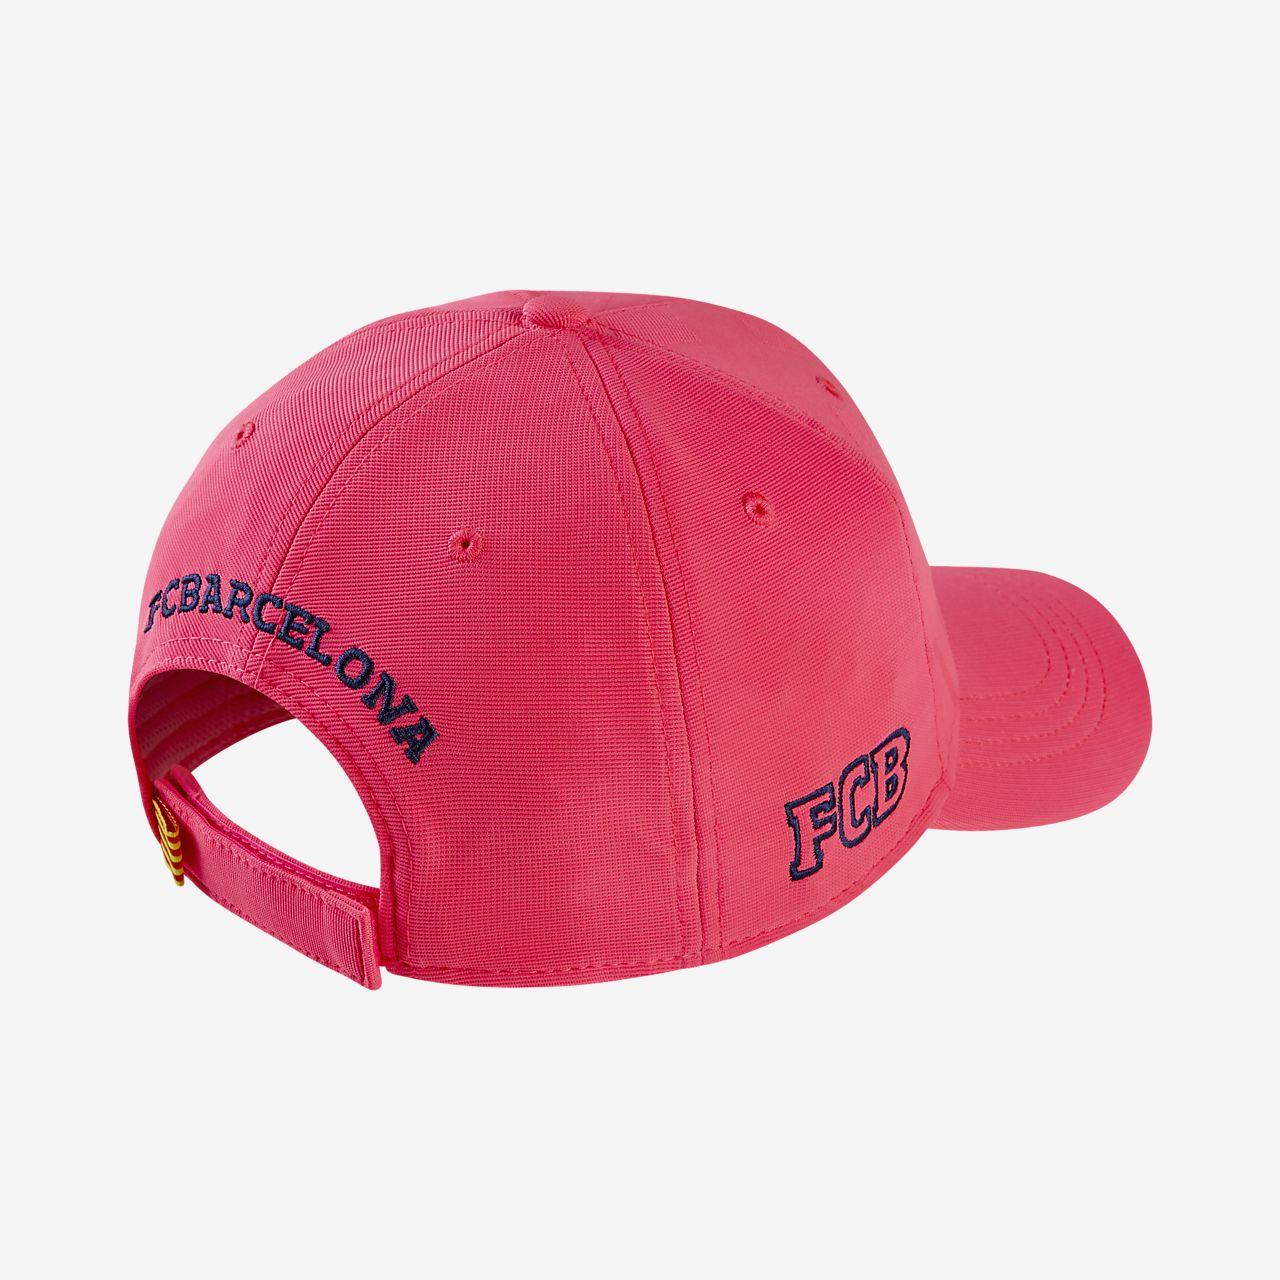 04e4d4f92c8 FC Barcelona Kids  Adjustable Hat. Nike.com LU